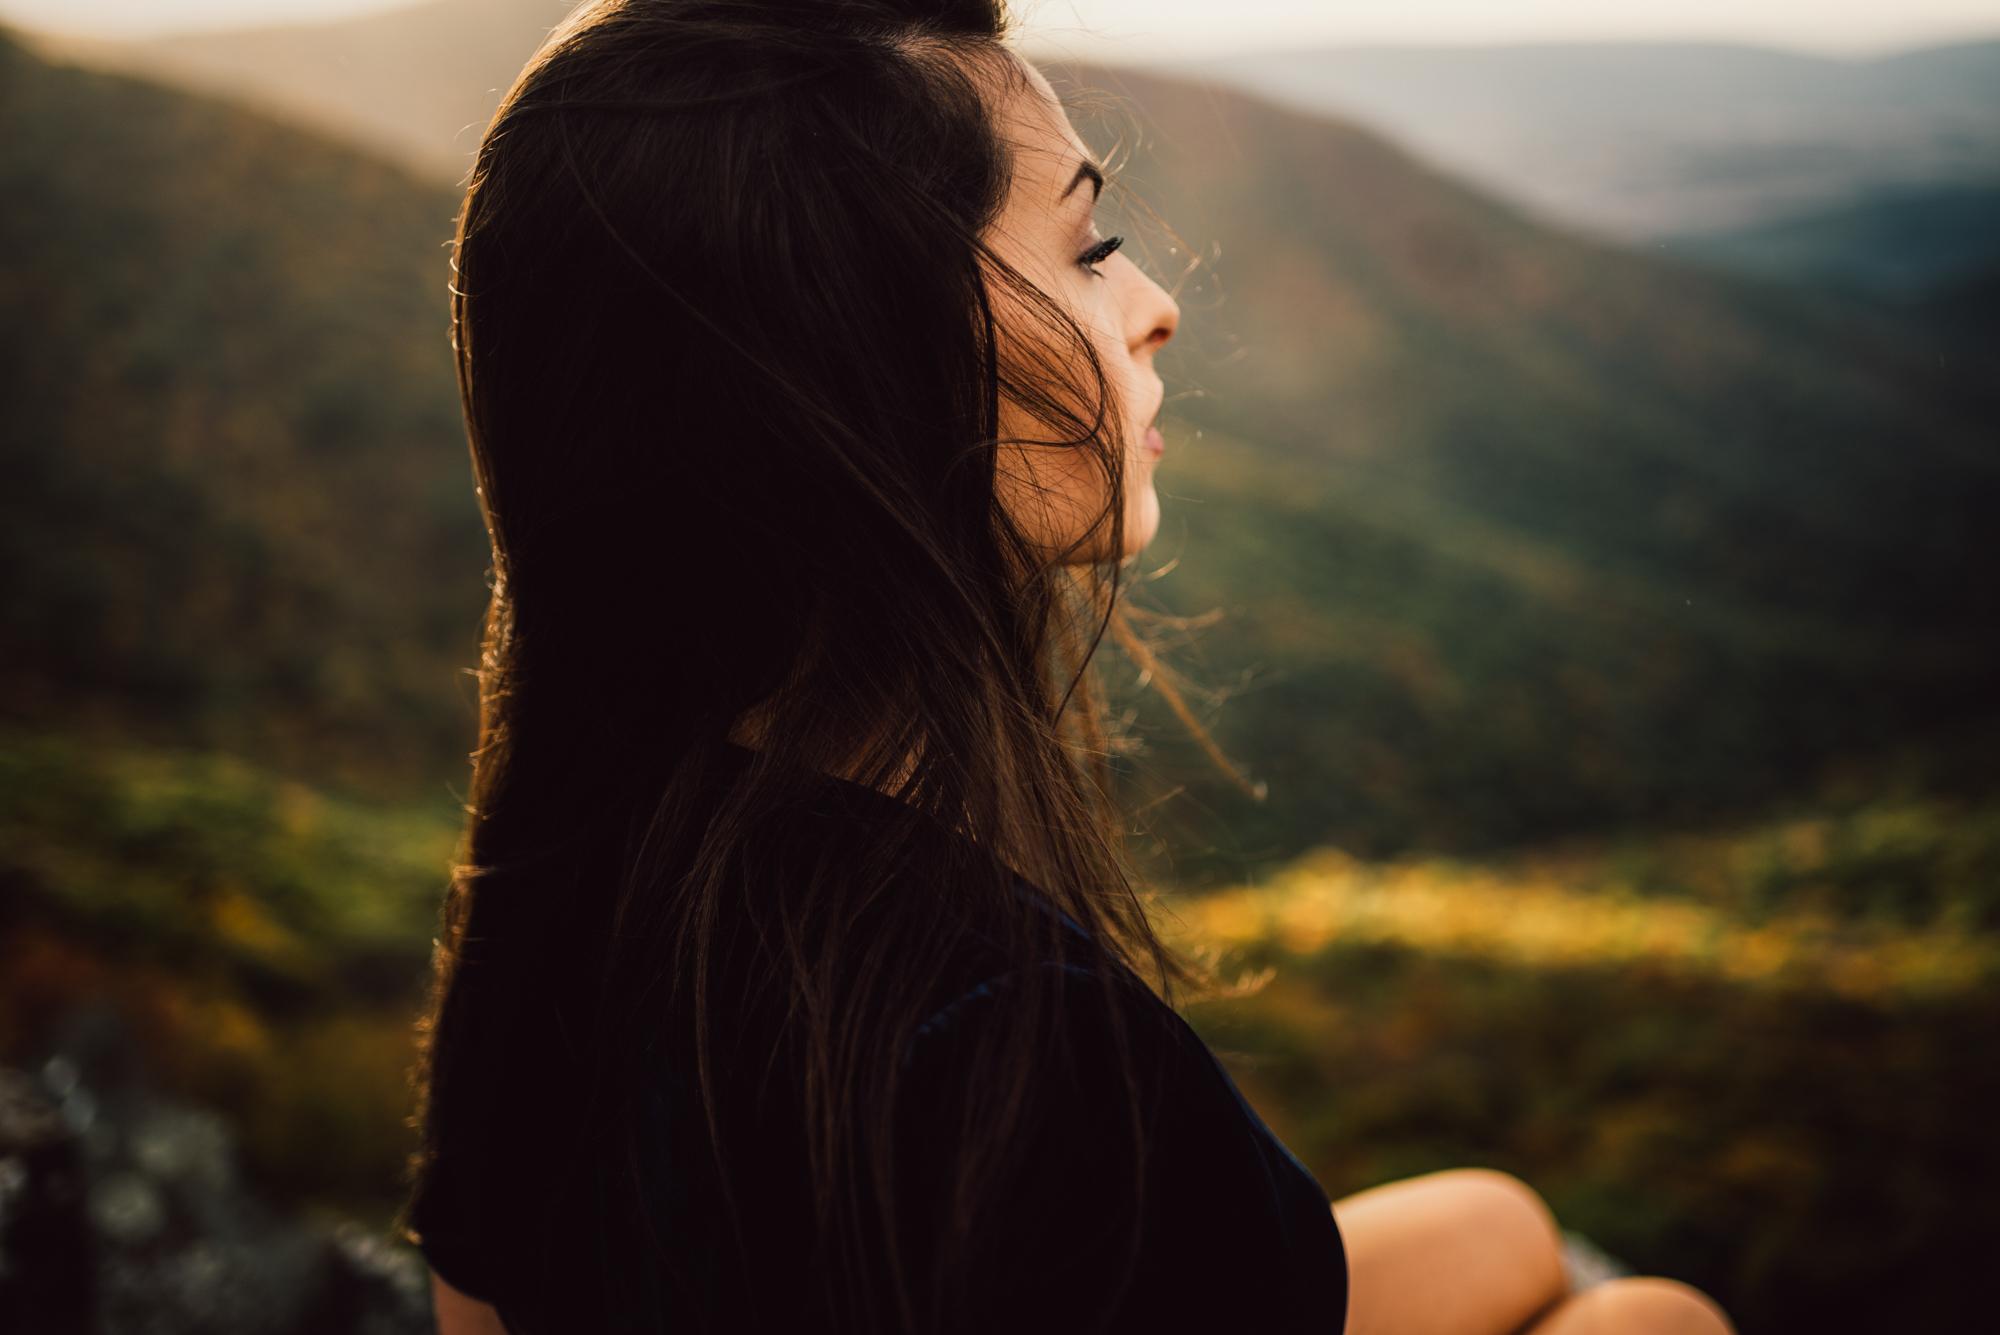 Megan_Shenandoah_National_Park_Windy_Romantic_Portraits_101.JPG